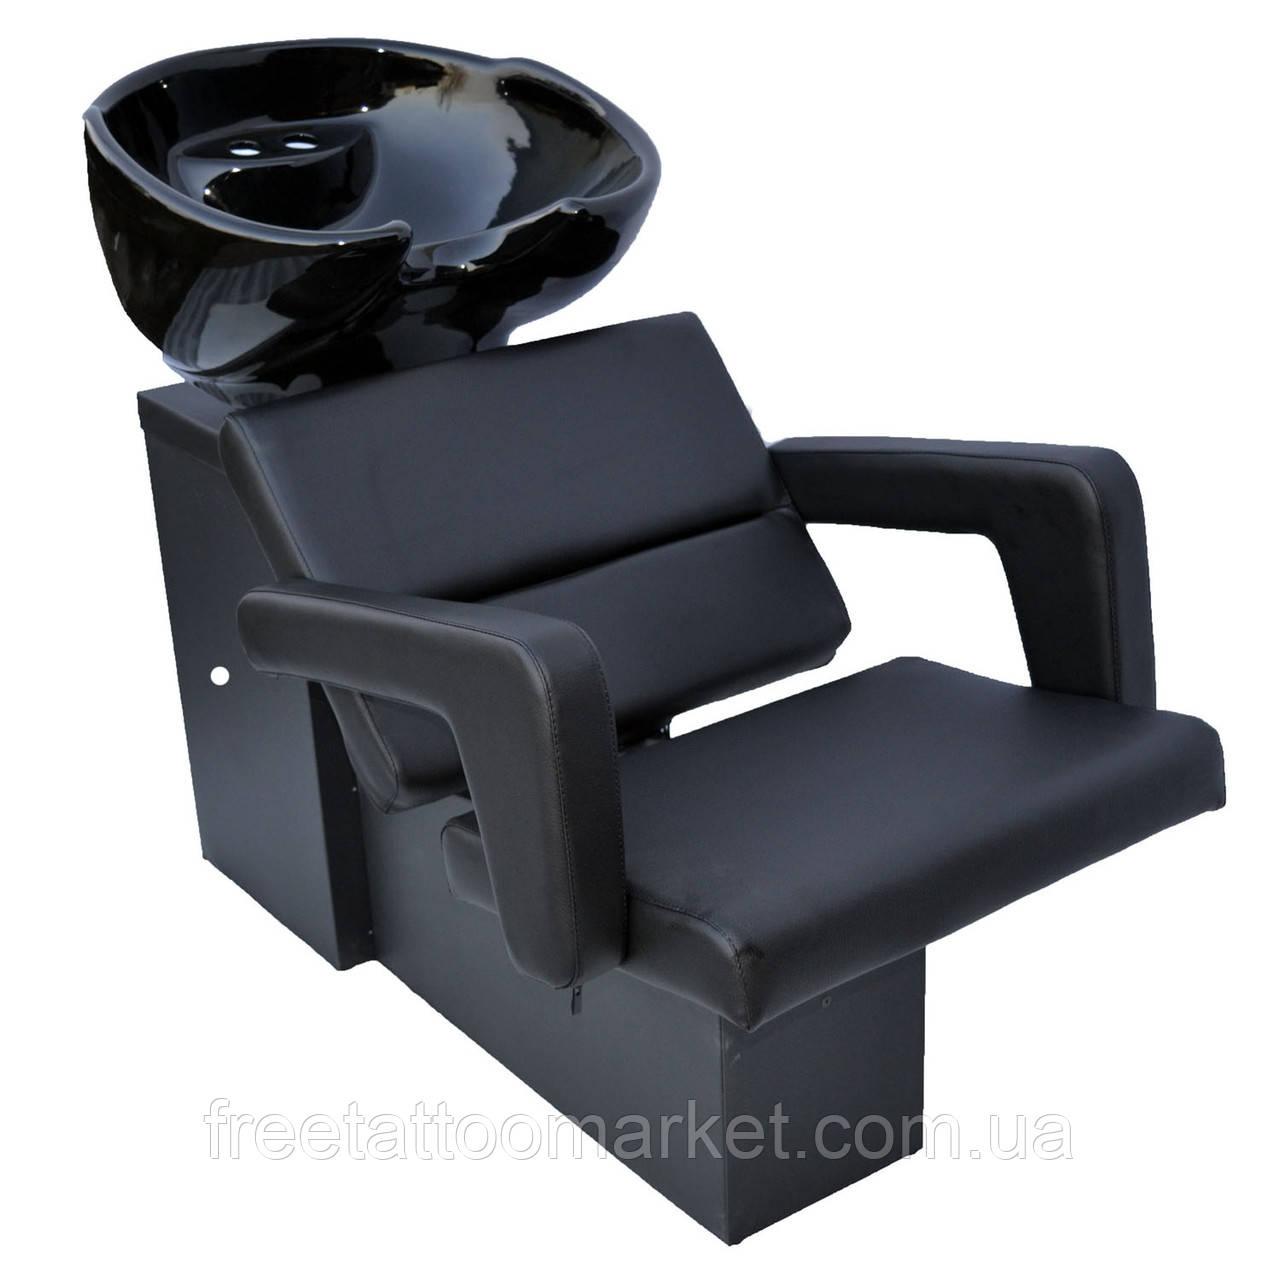 "Парикмахерская мойка Cheap c креслом Flamingo (Чип/Фламинго) Керамика Космо Италия (""сантехника стандарт"")"